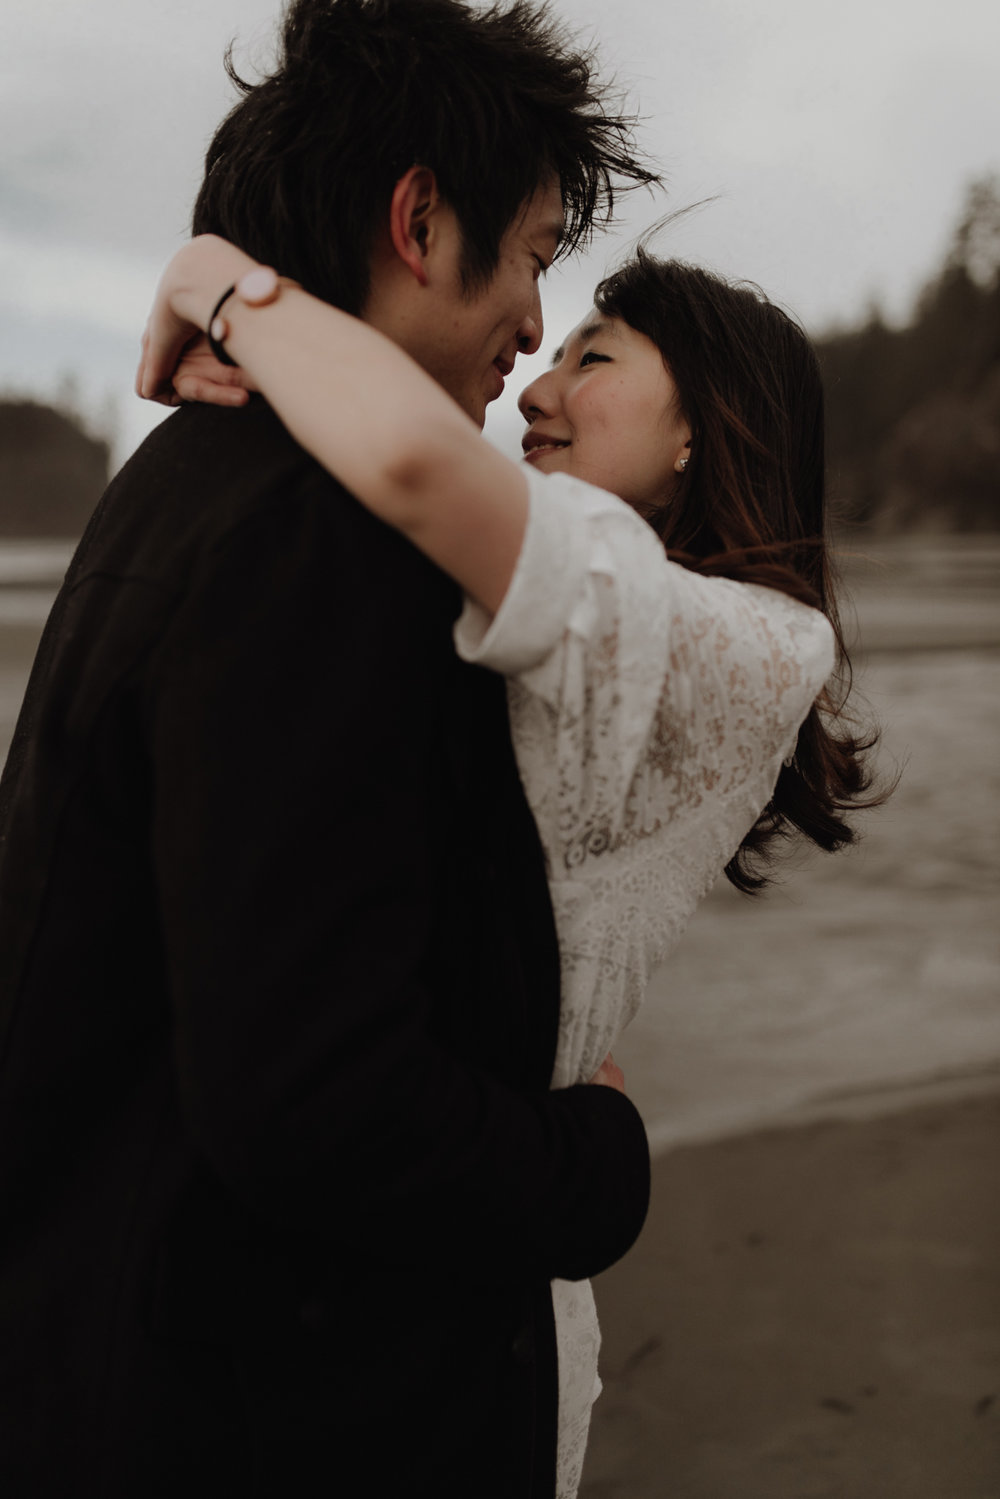 seattle-wedding-photographer-kerouac-0261.jpg